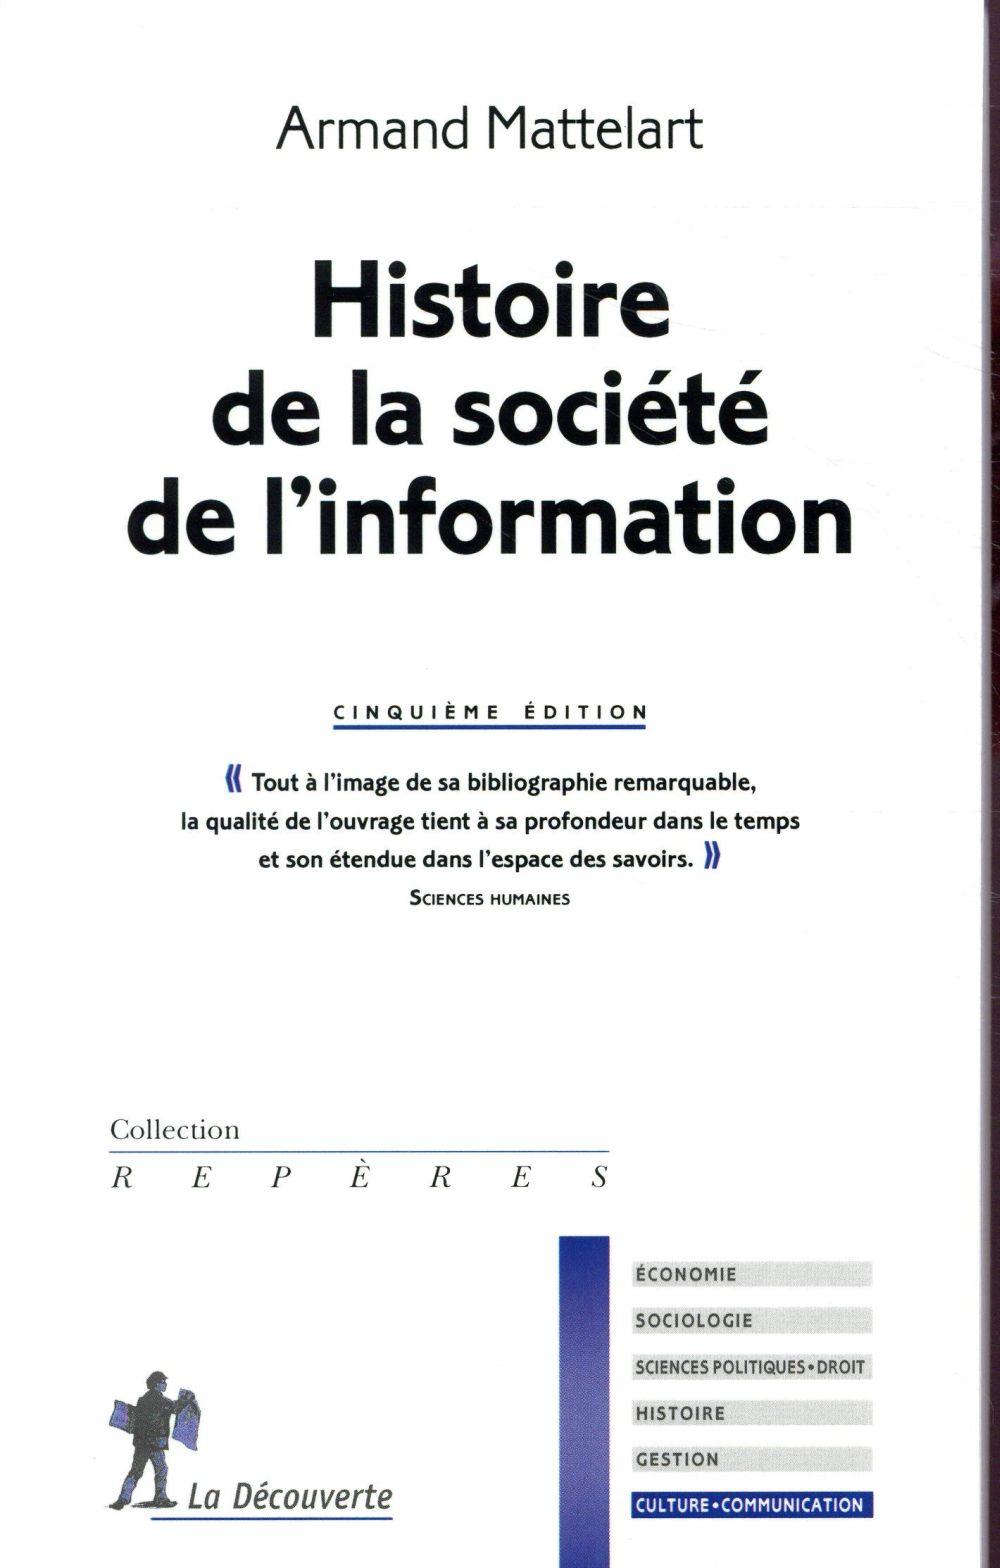 HISTOIRE DE LA SOCIETE DE L'INFORMATION (5E EDITION) MATTELART ARMAND LA DECOUVERTE